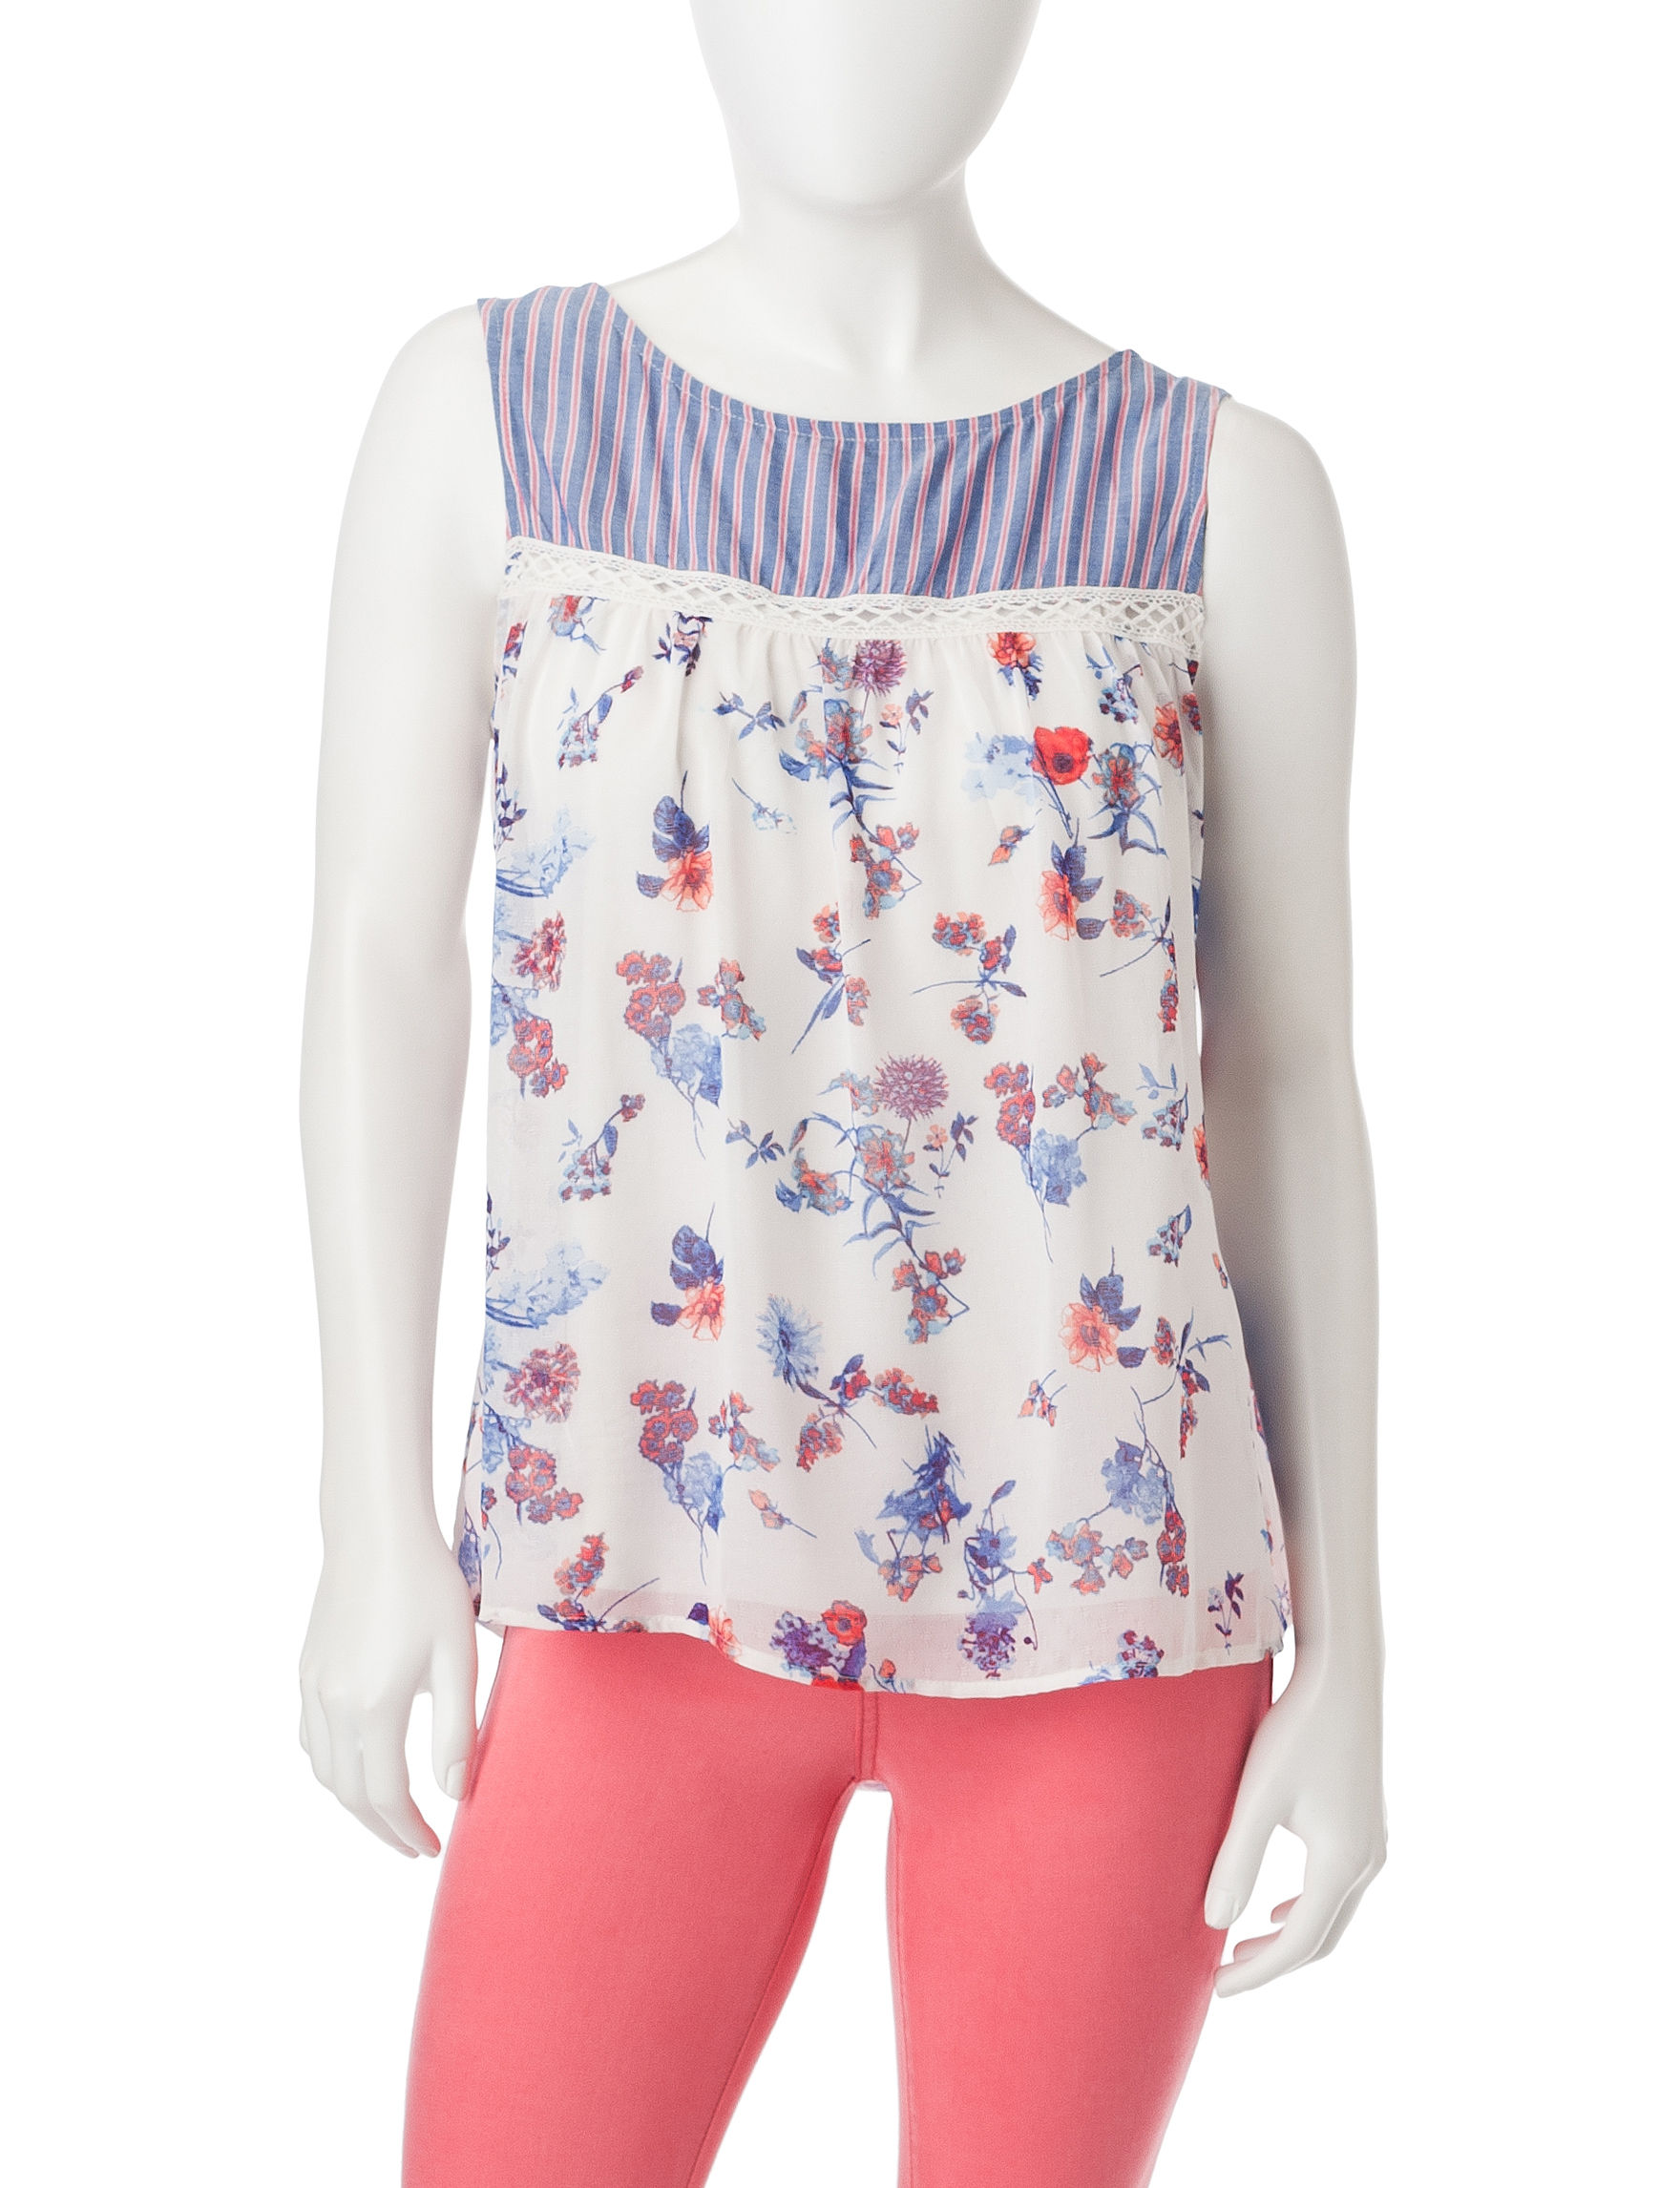 Figuero & Flower Light Blue Shirts & Blouses